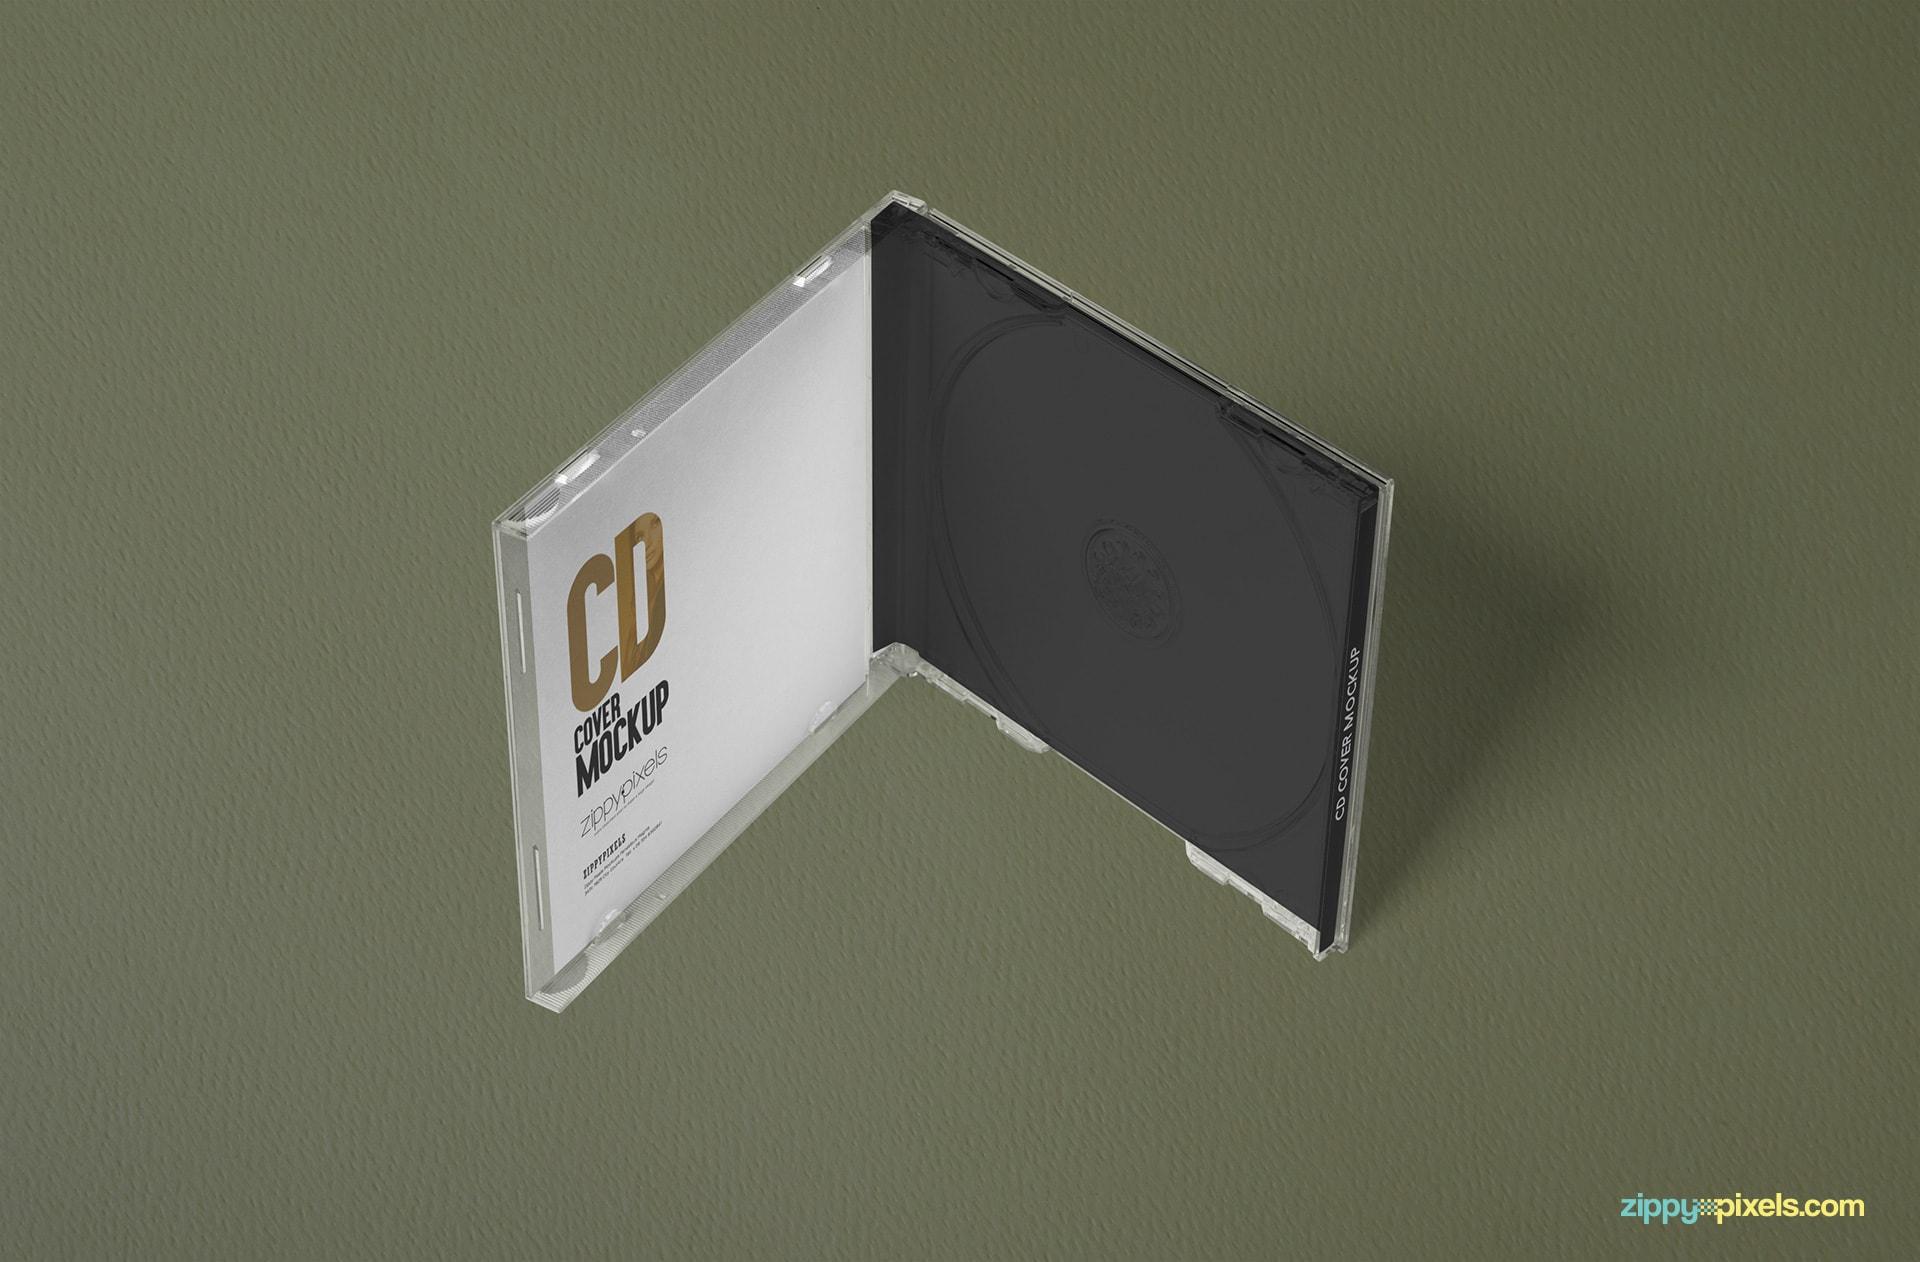 plastic-cd-jewel-case-mockup-inside-viee